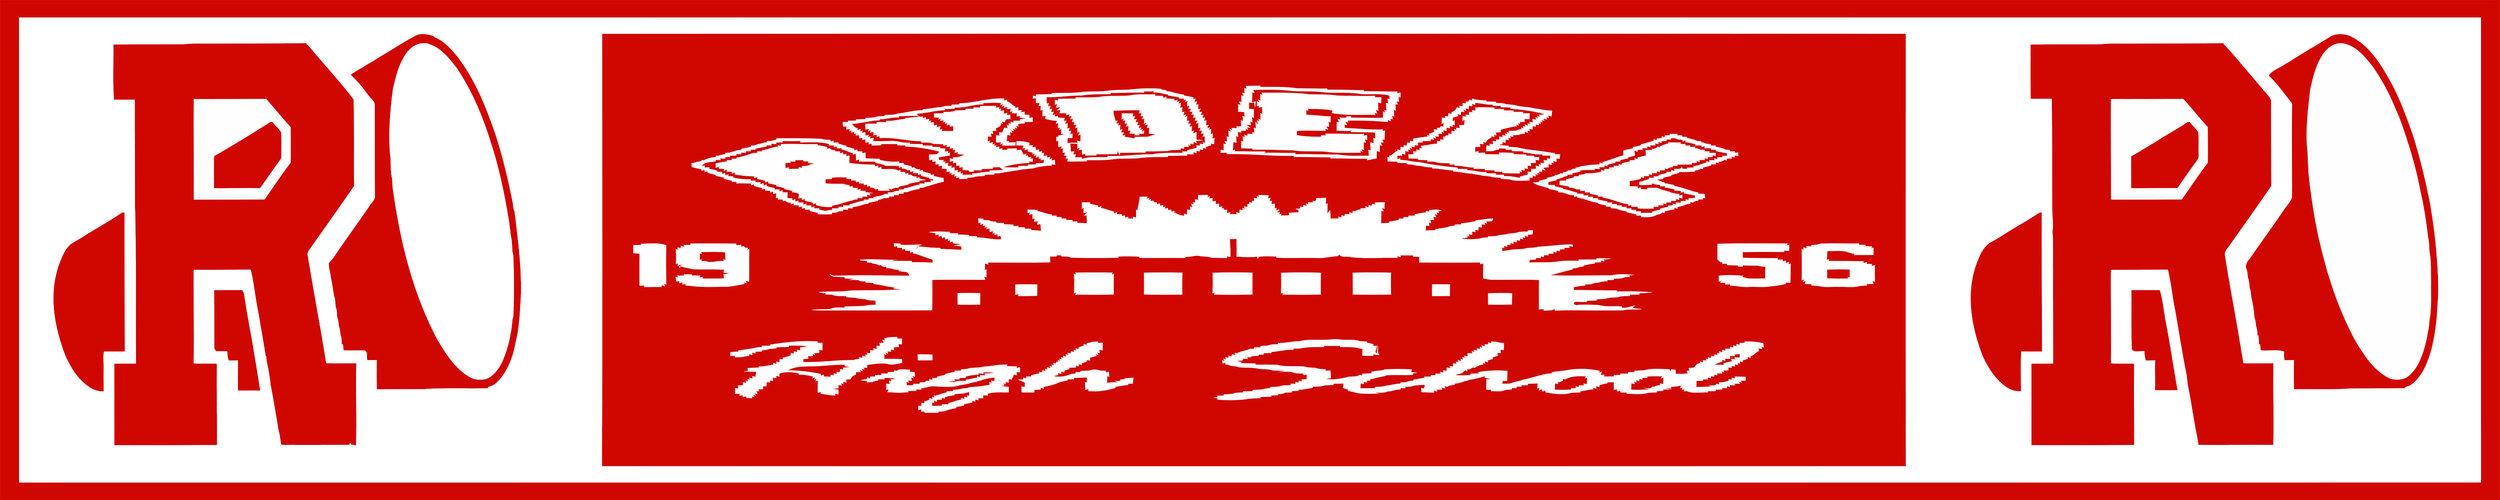 RYDELL High School Banner - 10' x 2'